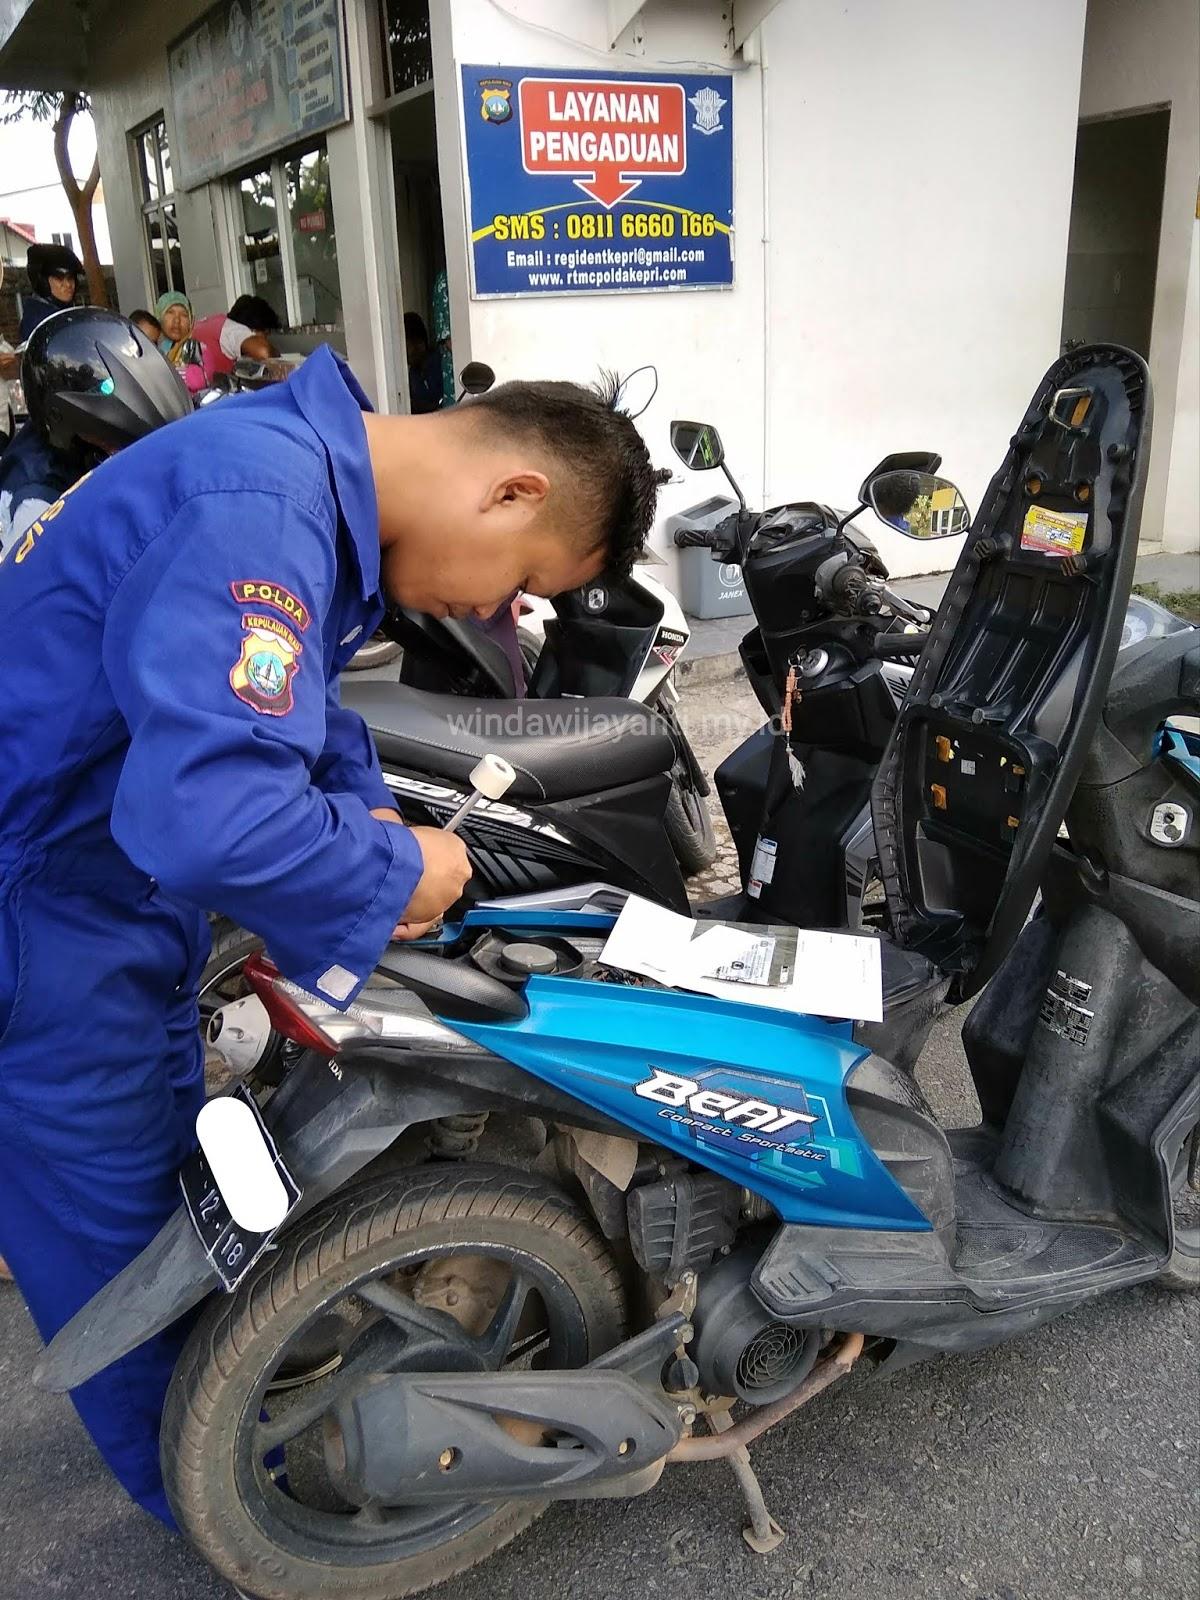 Perpanjang STNK dan Ganti Plat Motor 5 Tahunan di Samsat ...